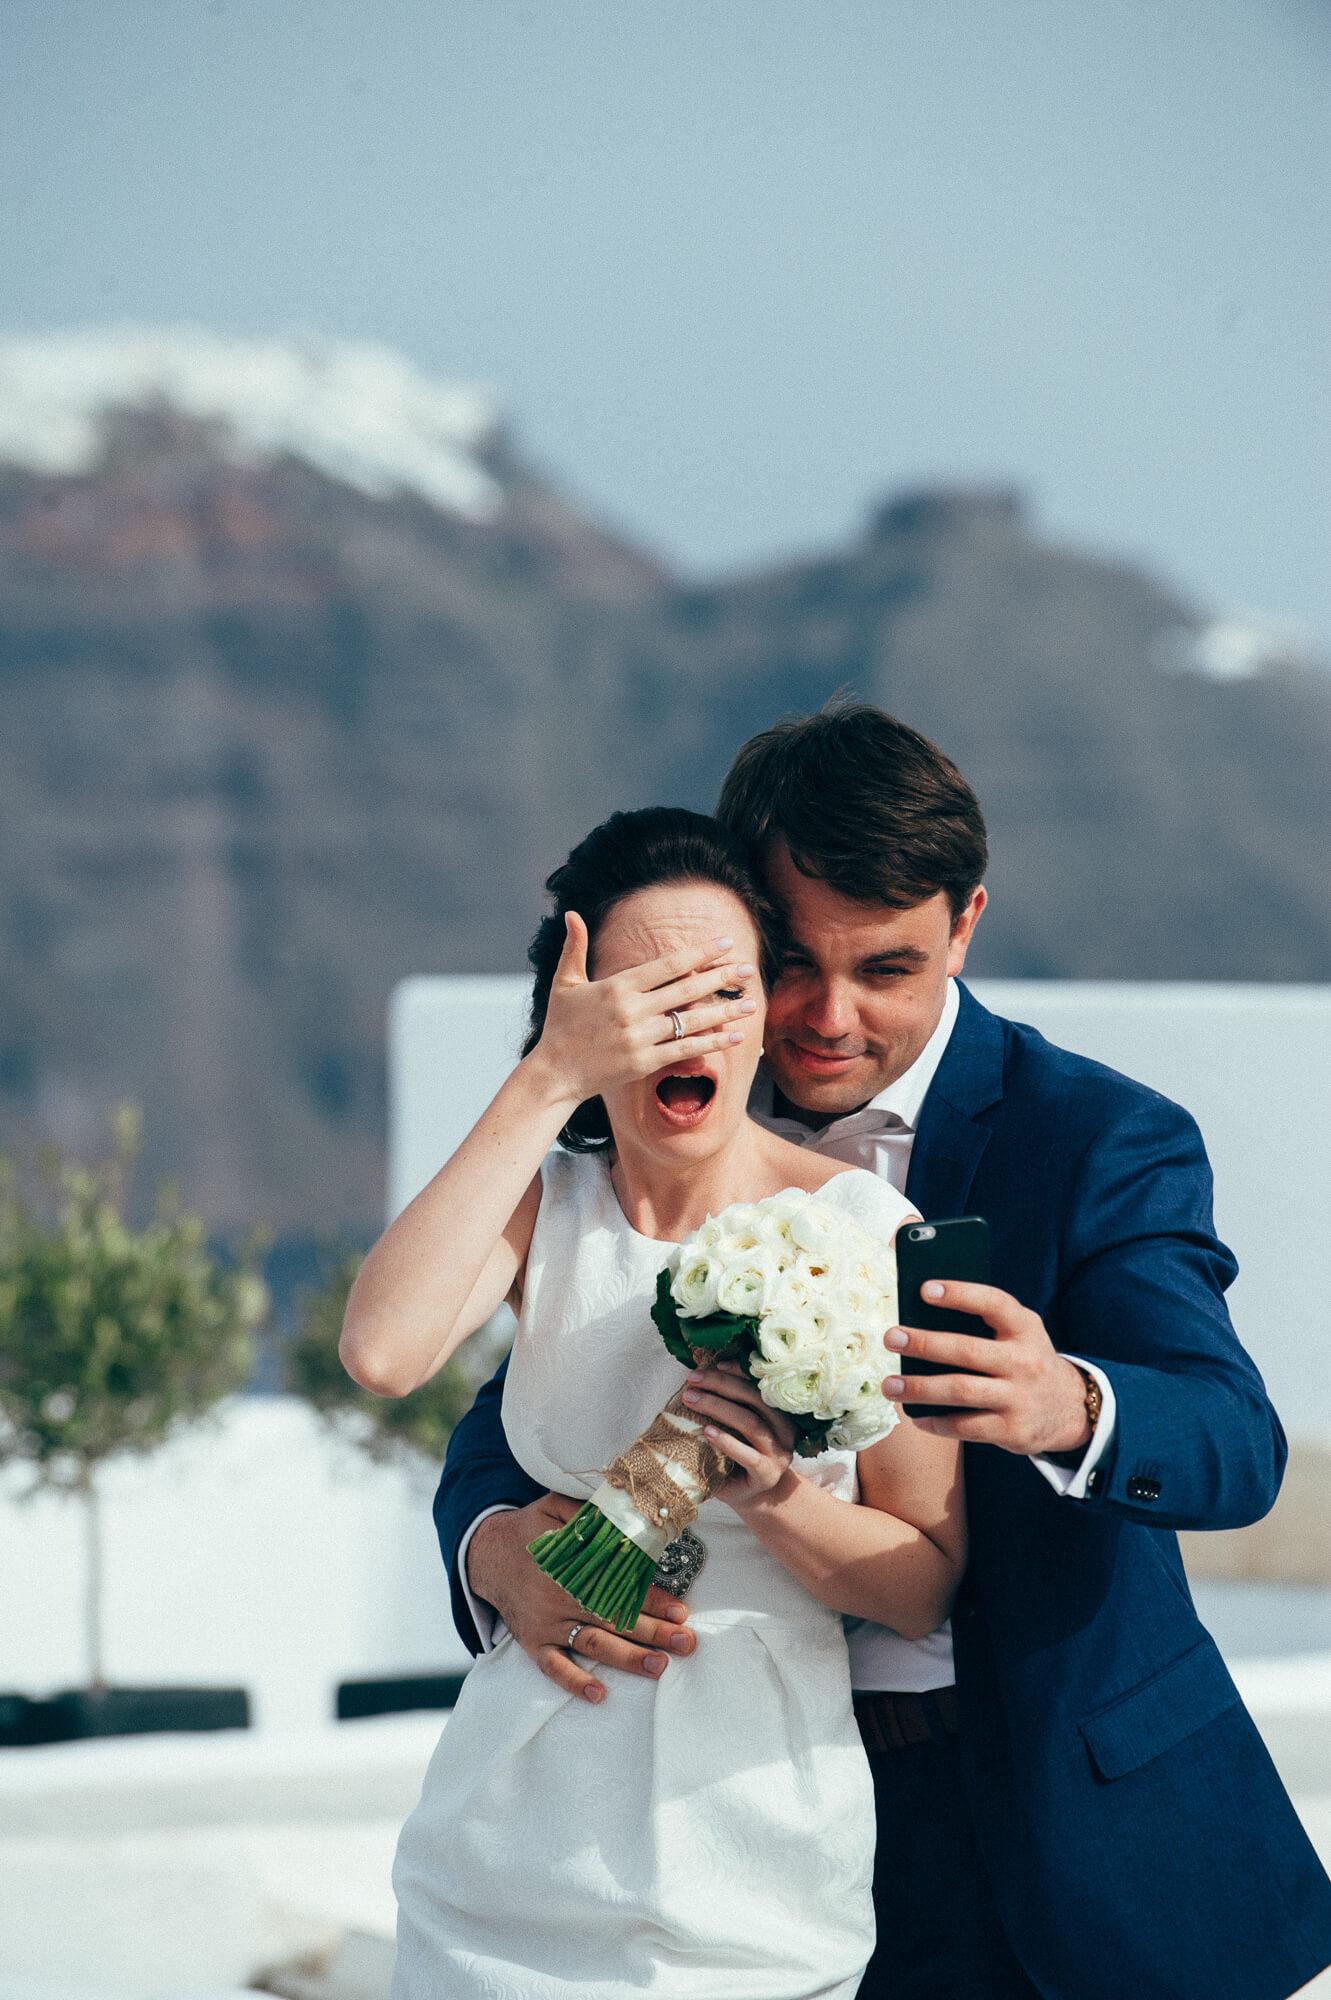 manes-wedding-photographer-greece-153